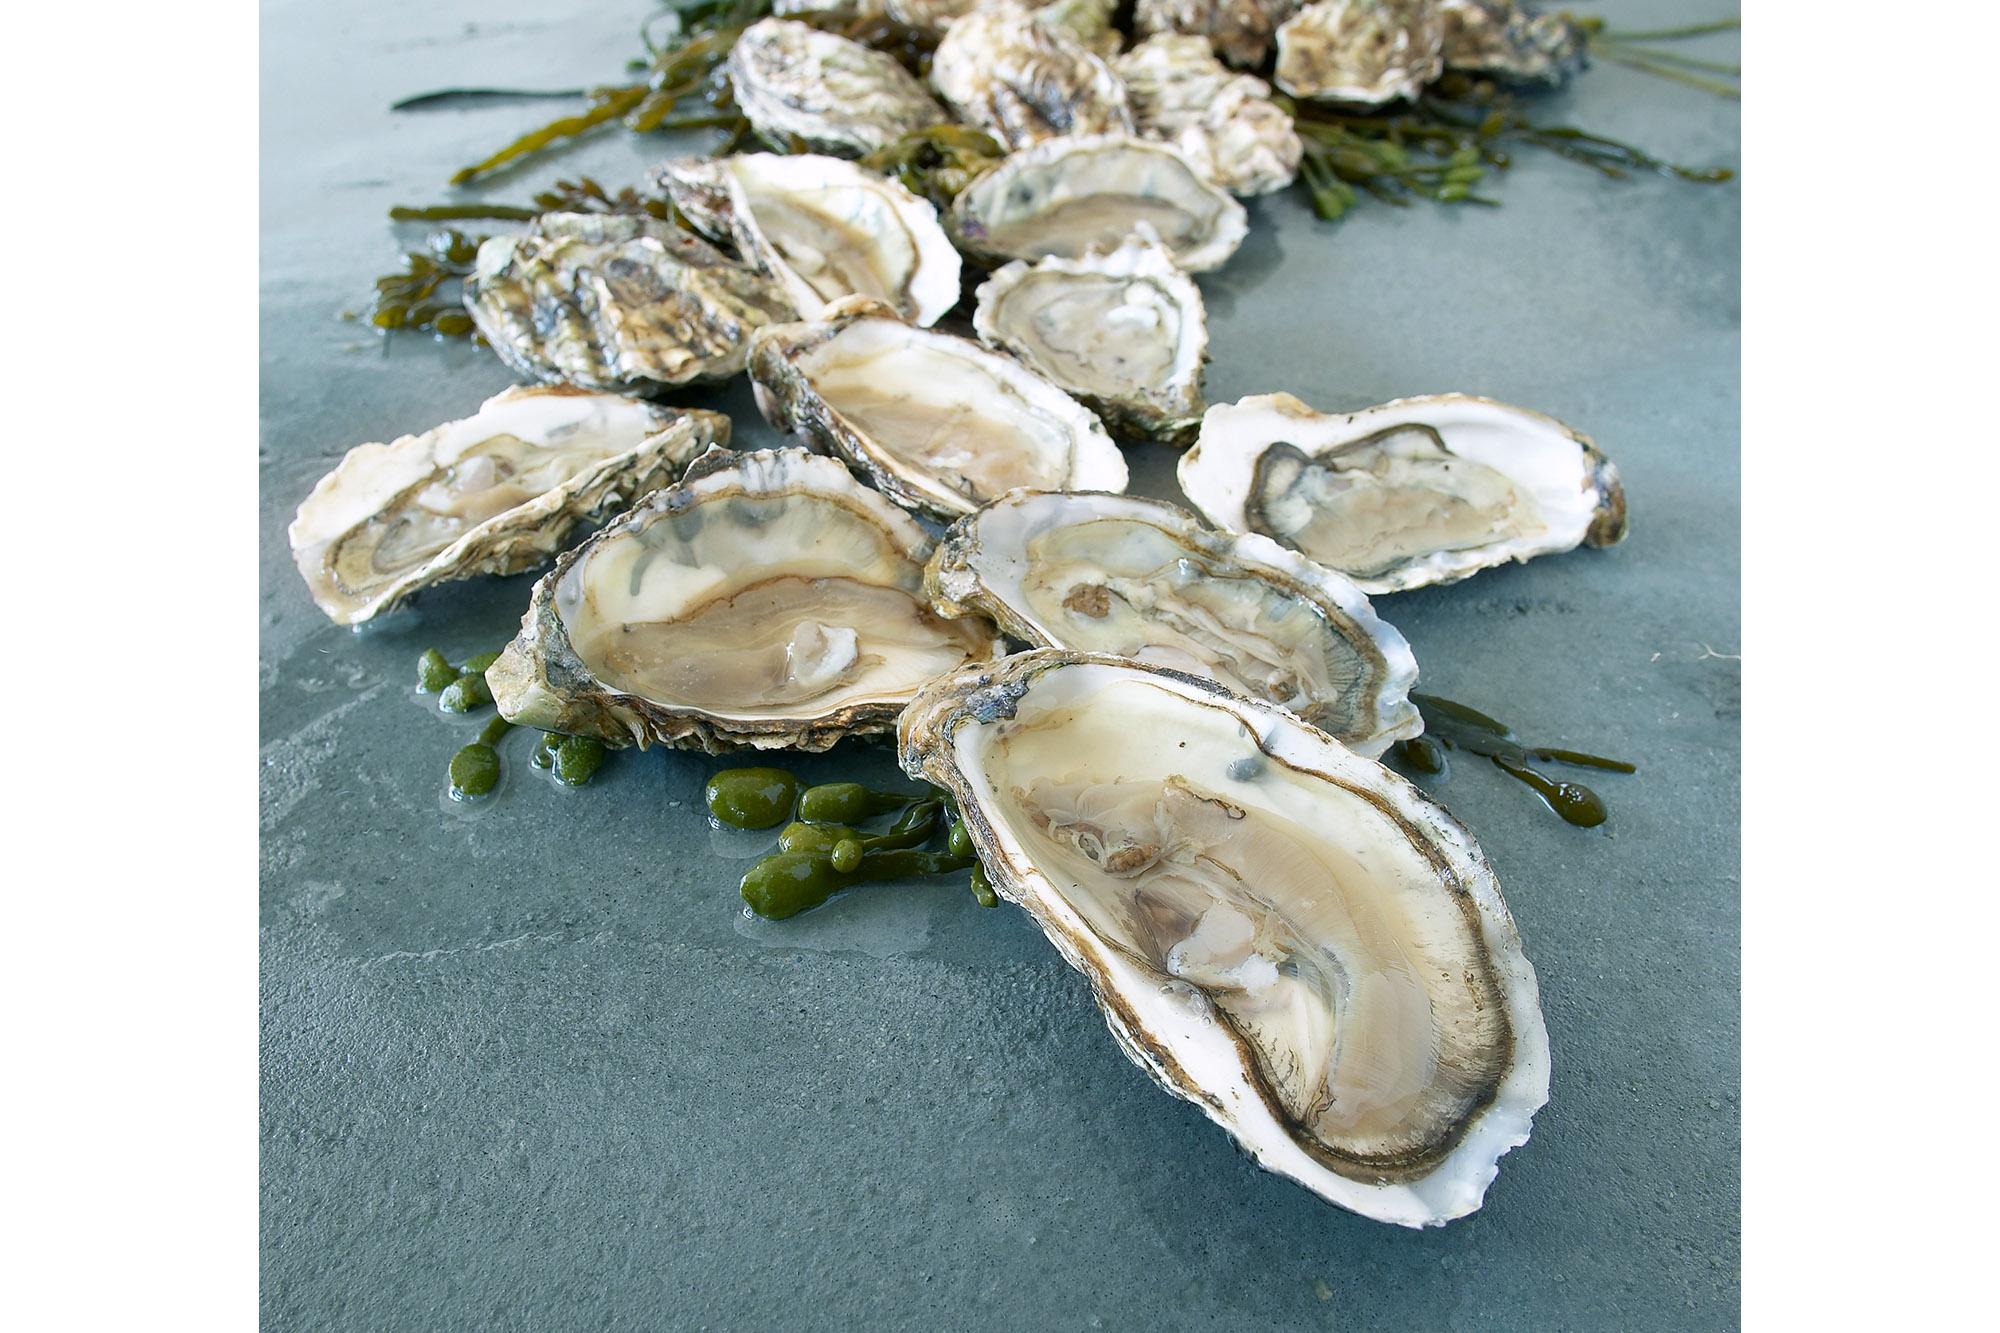 SPUISERS food fotografie oester